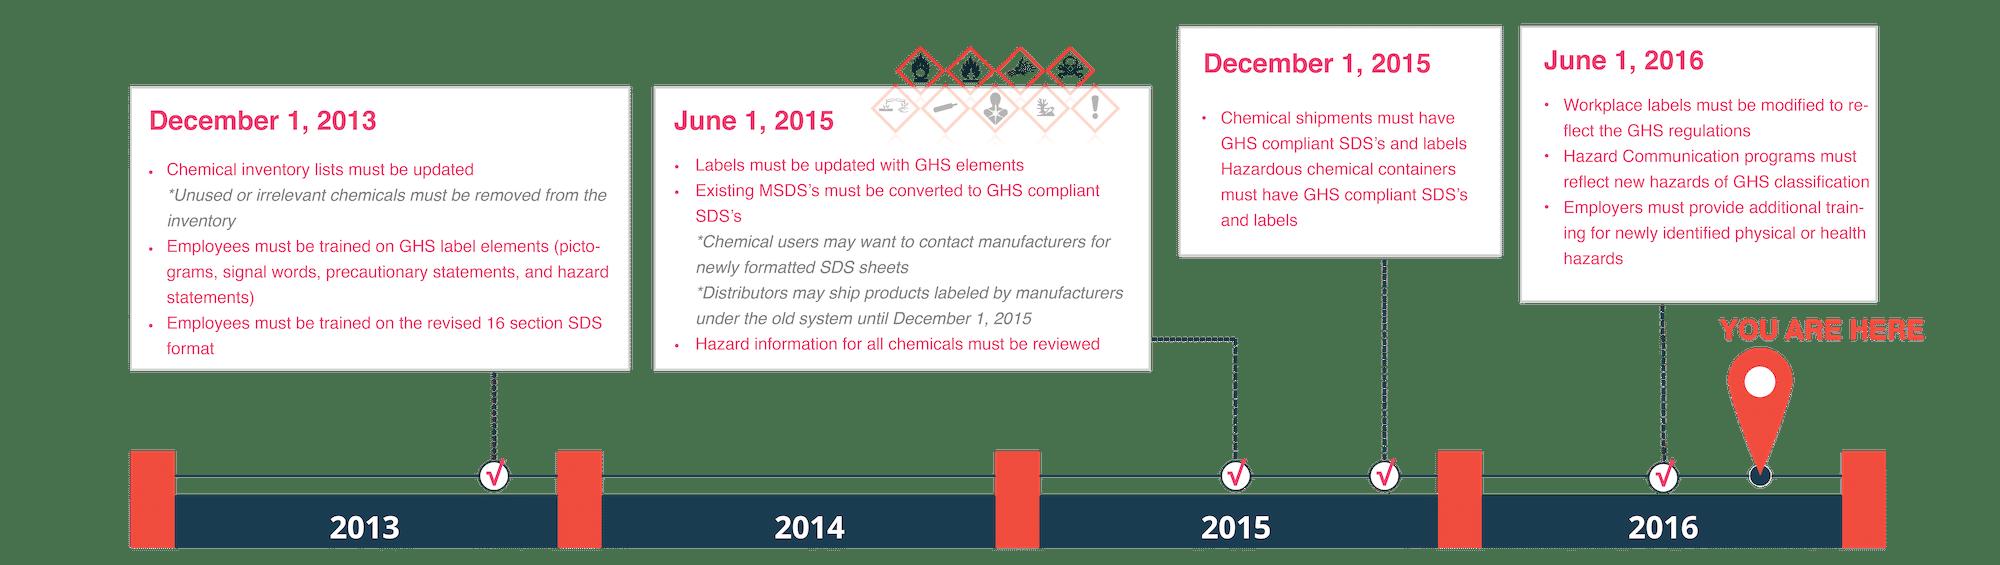 Horizontal 2016 GHS Timeline